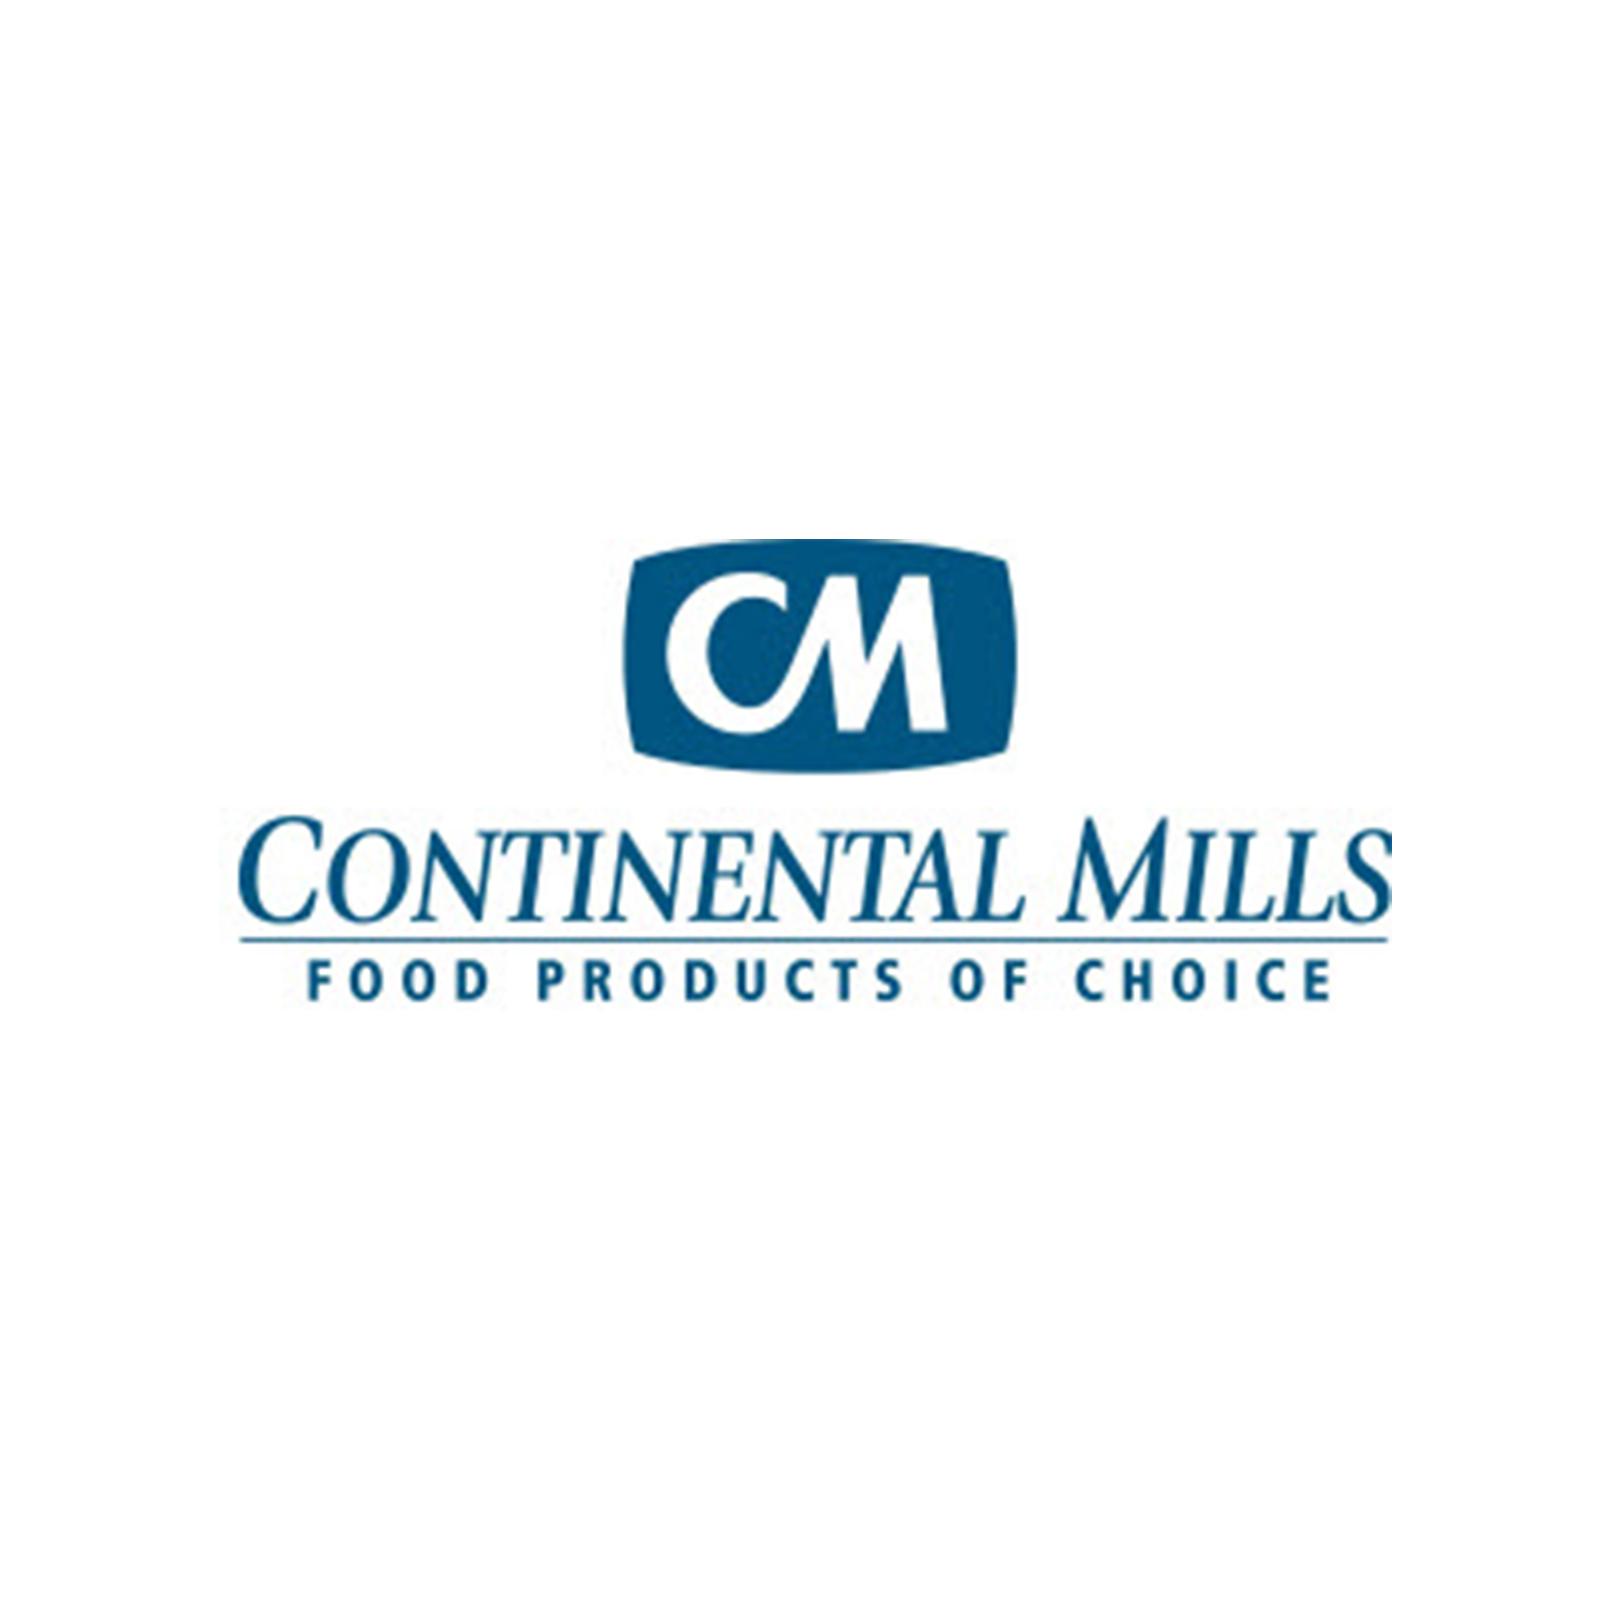 Continental Mills logo 2.jpg